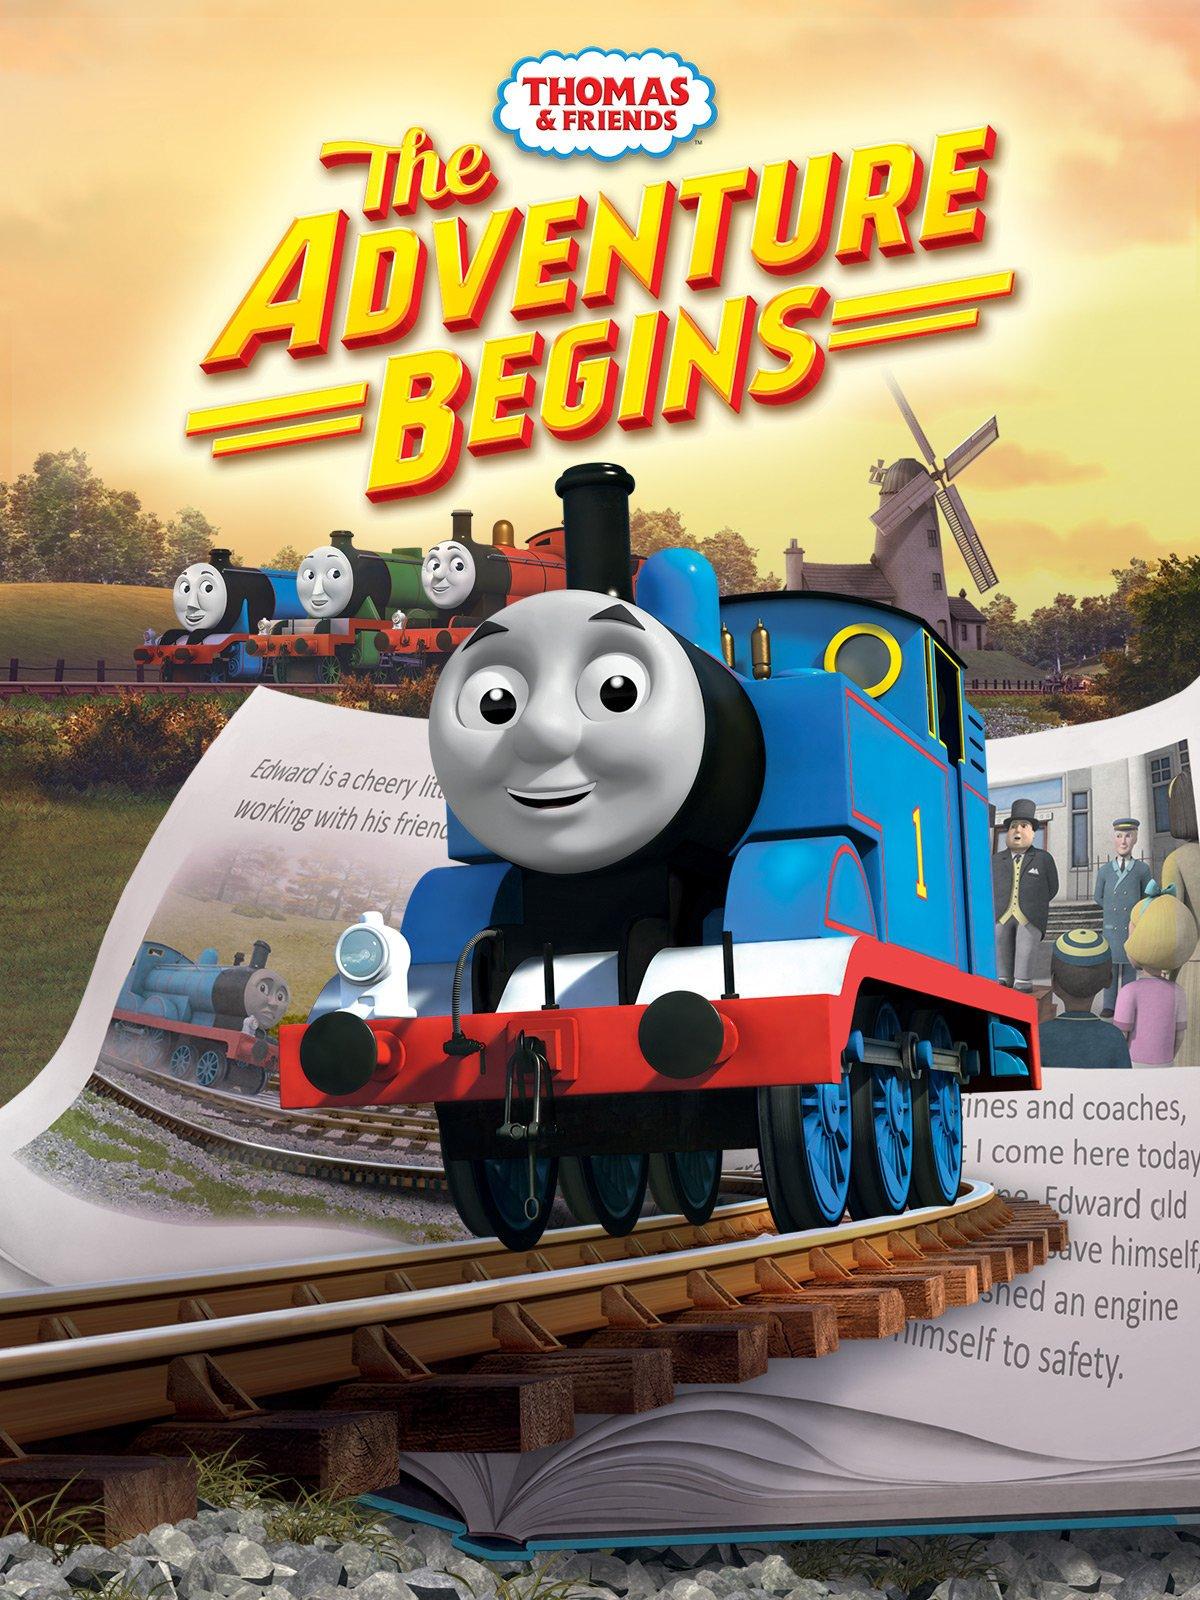 The Adventure Begins  Thomas the Tank Engine Wikia  Fandom